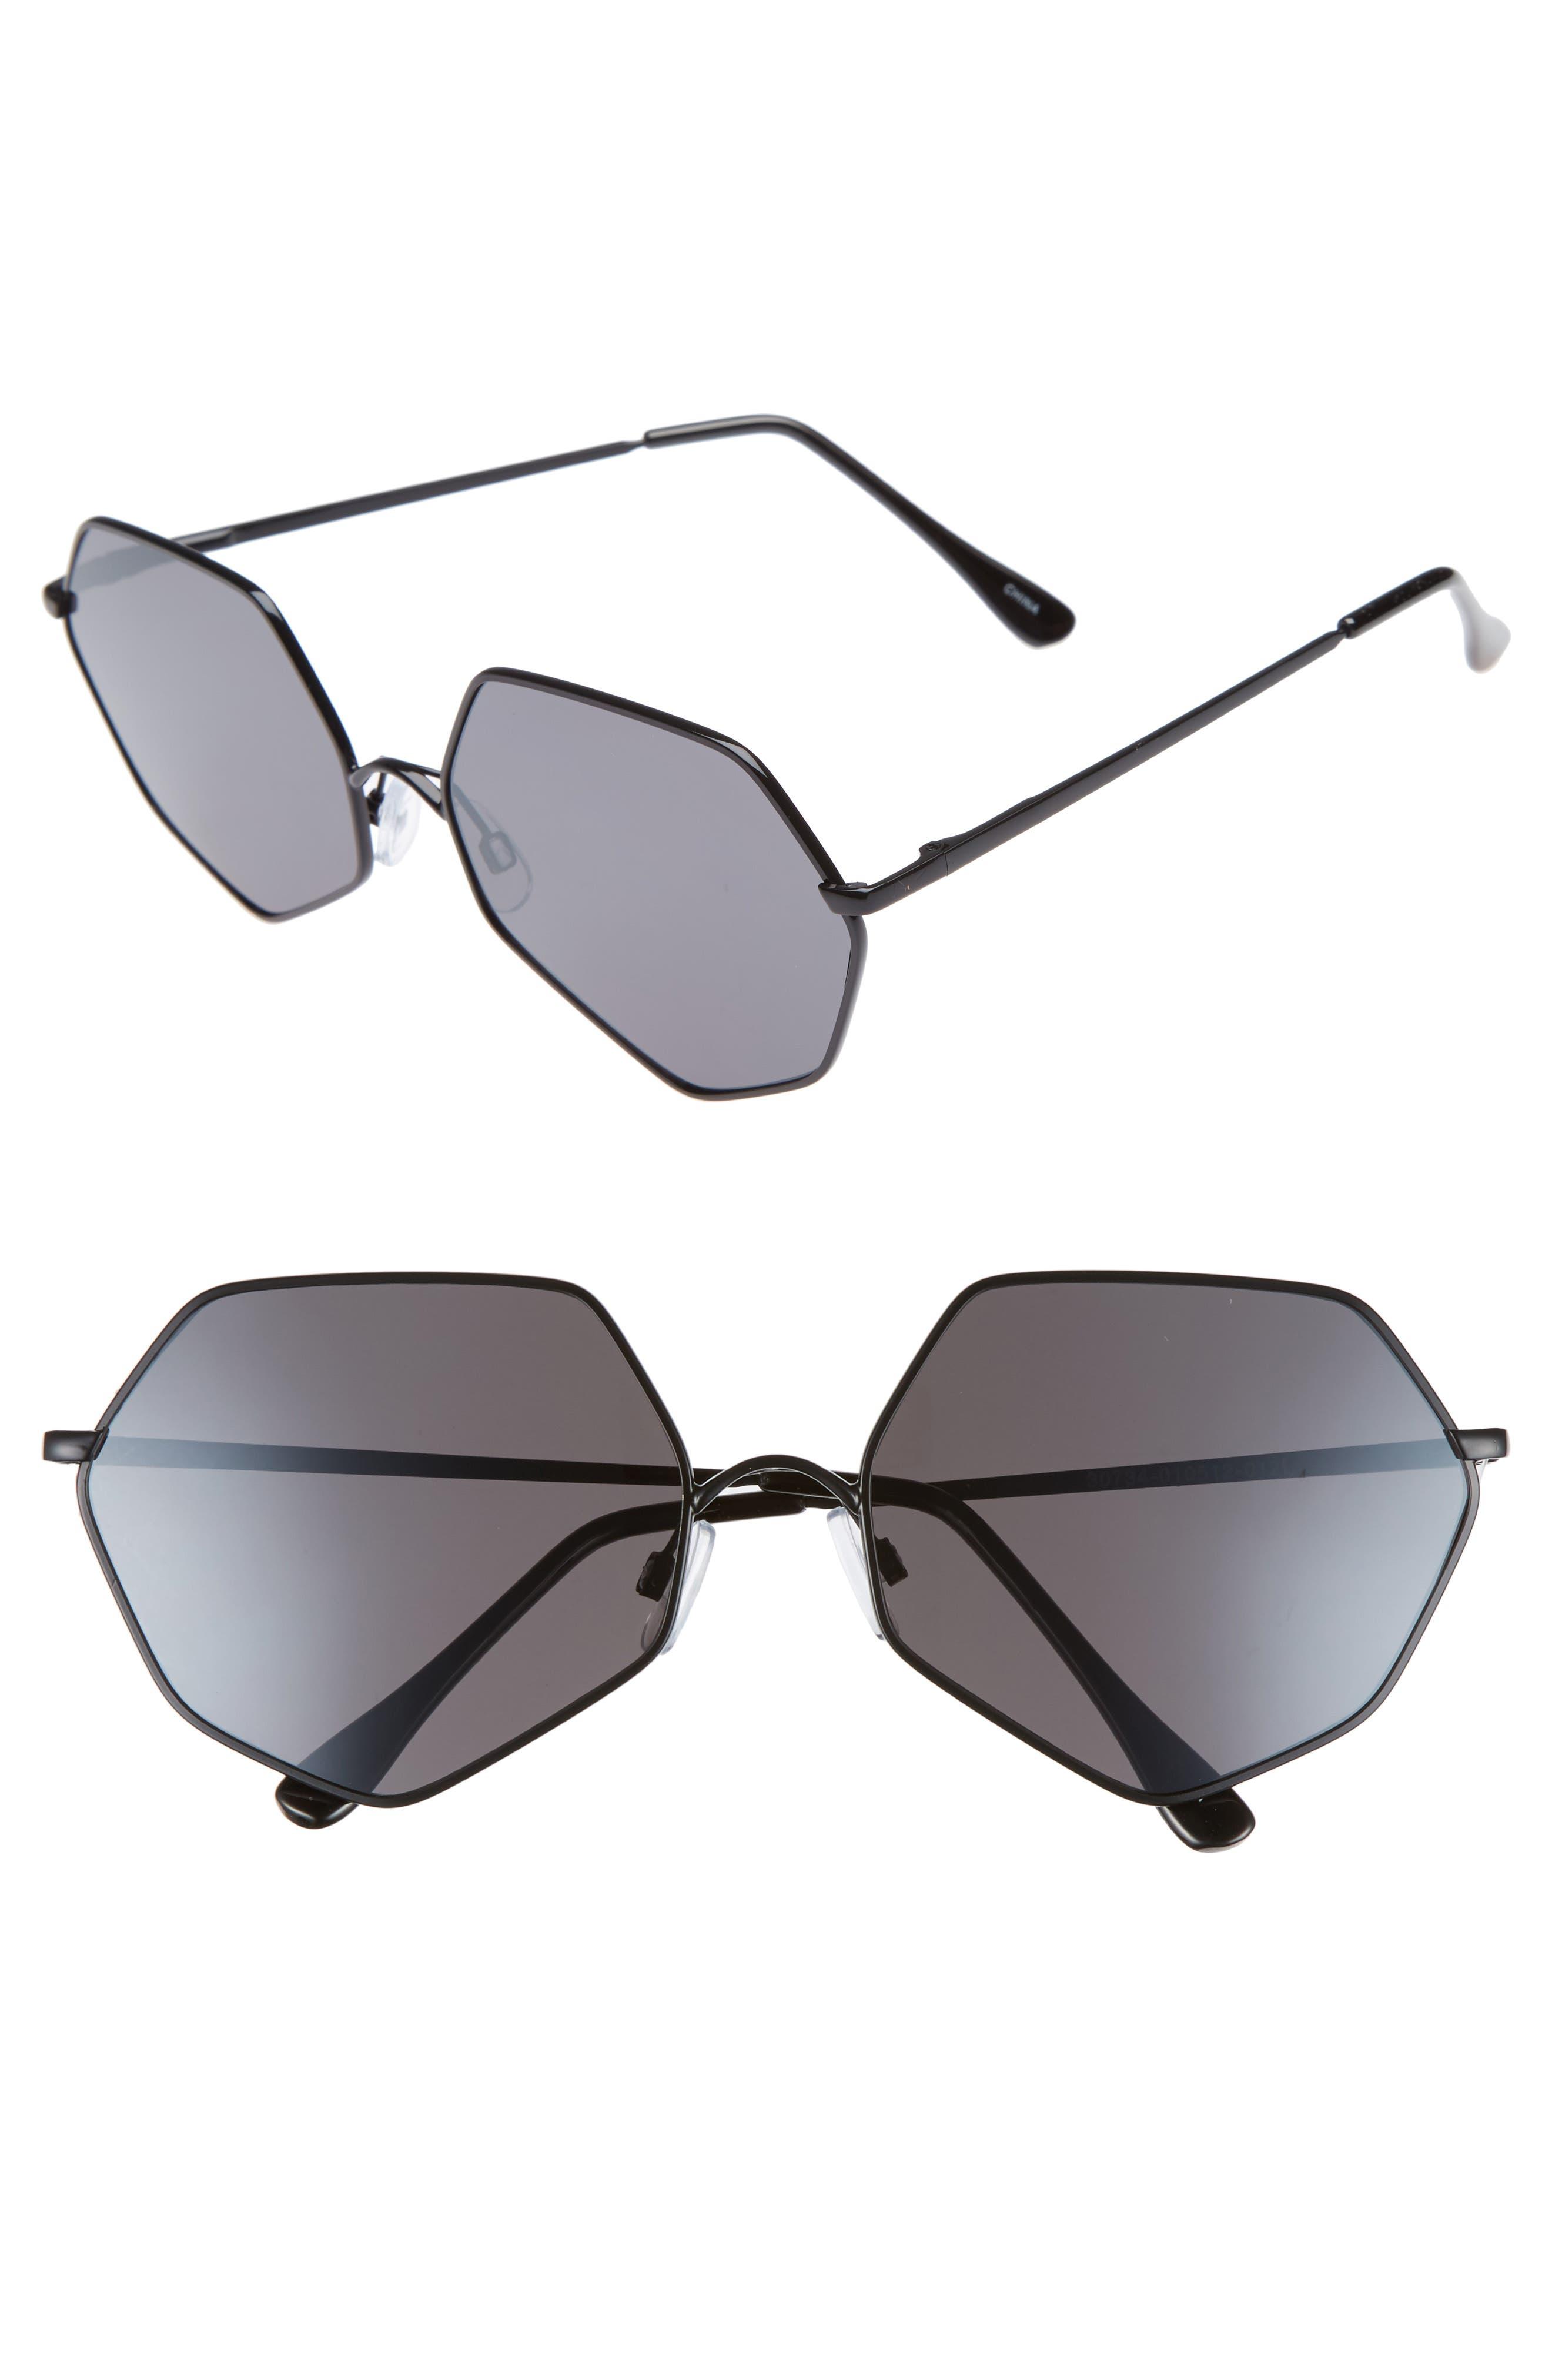 60 mm Geometric Metal Aviator Sunglasses,                         Main,                         color, Black/ Black